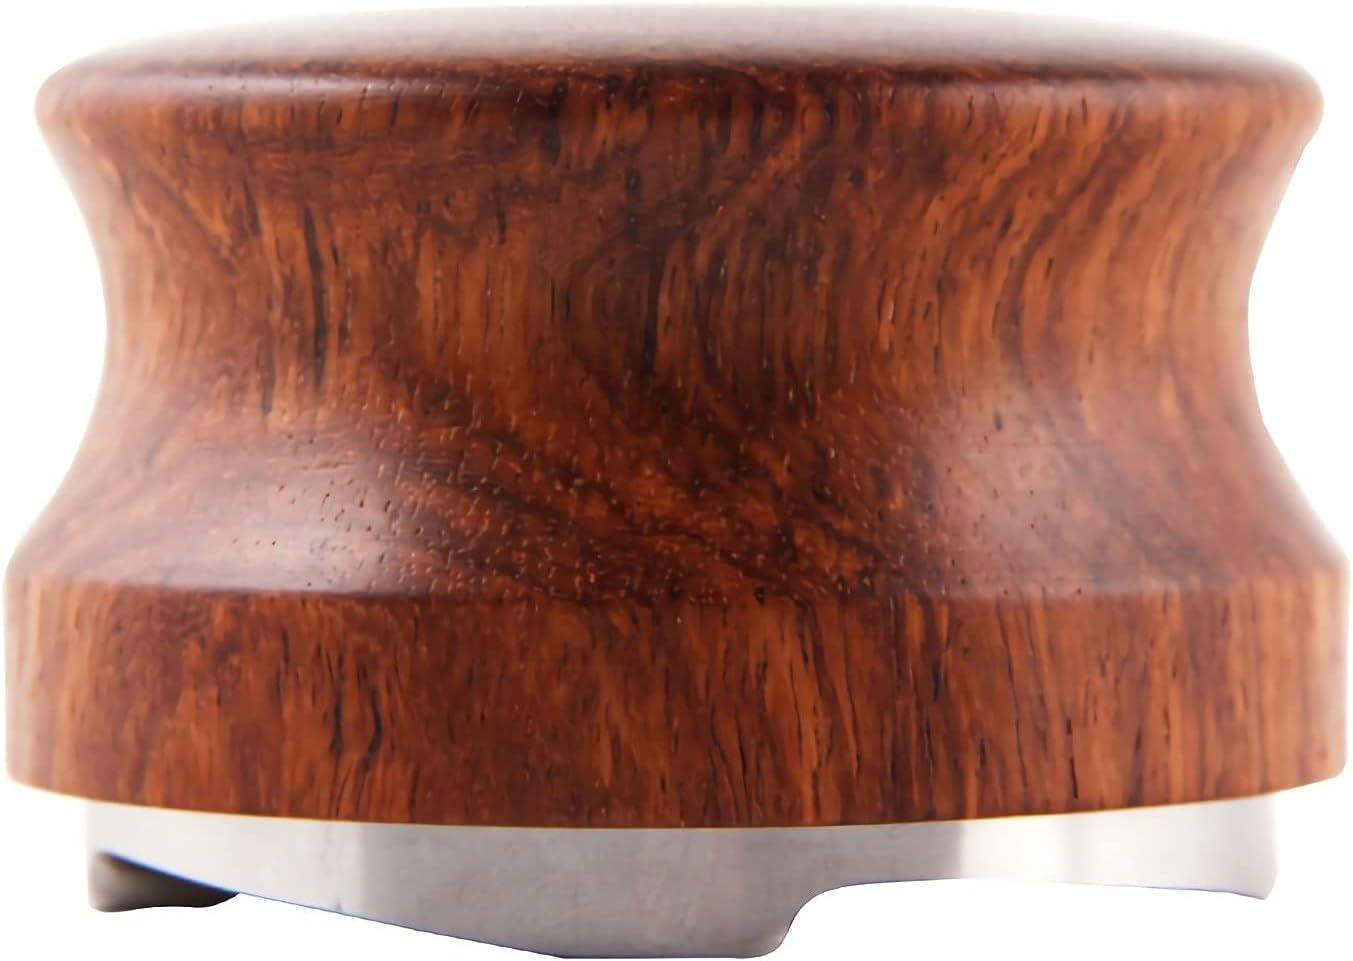 Details about  /Wingjip Coffee Distributor//Leveler Tool 58Mm Tamper Stainless Steel Anti Slip Ha